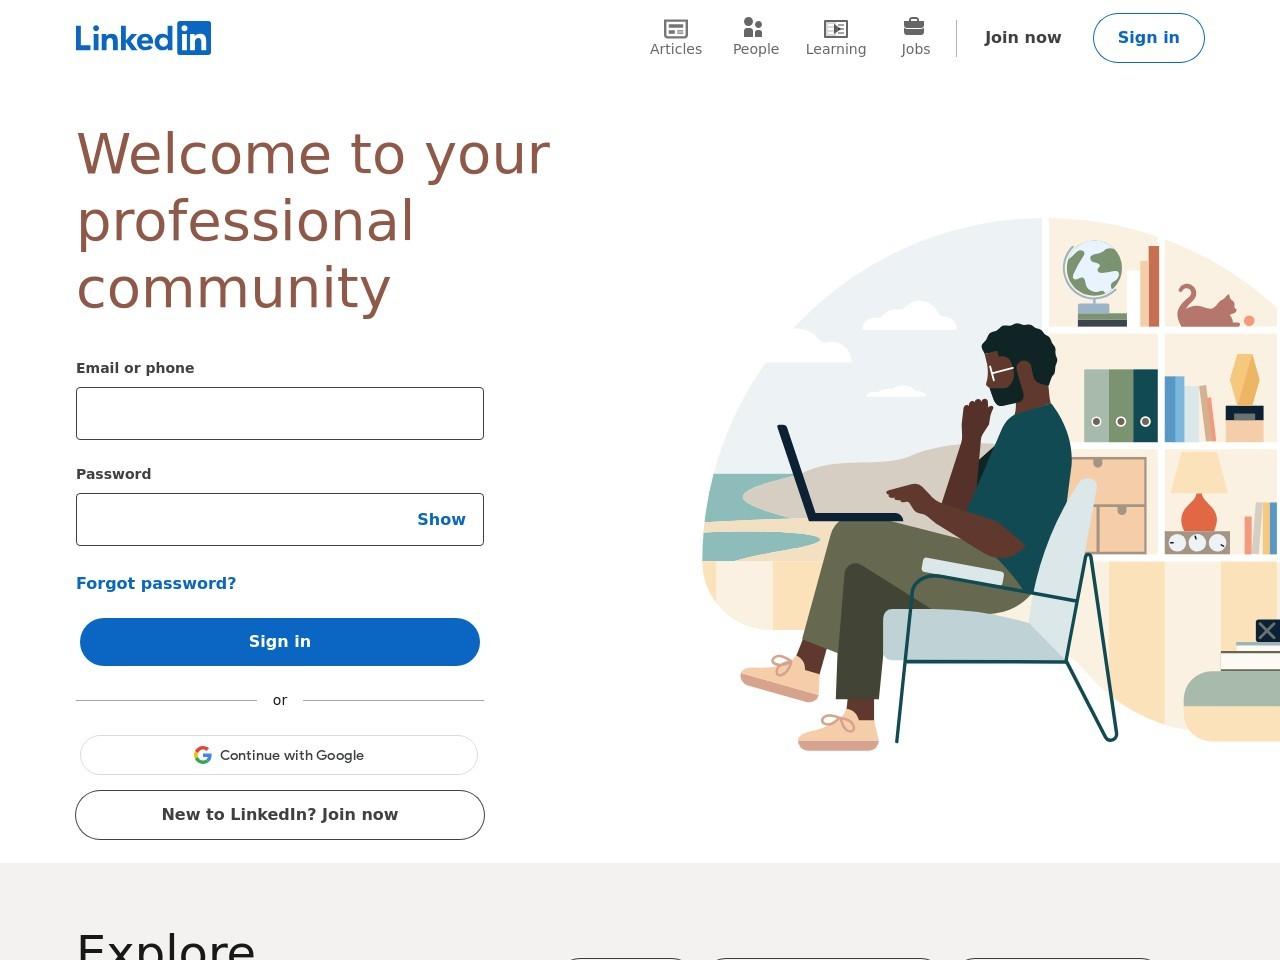 Webthumbnail linkedin.com